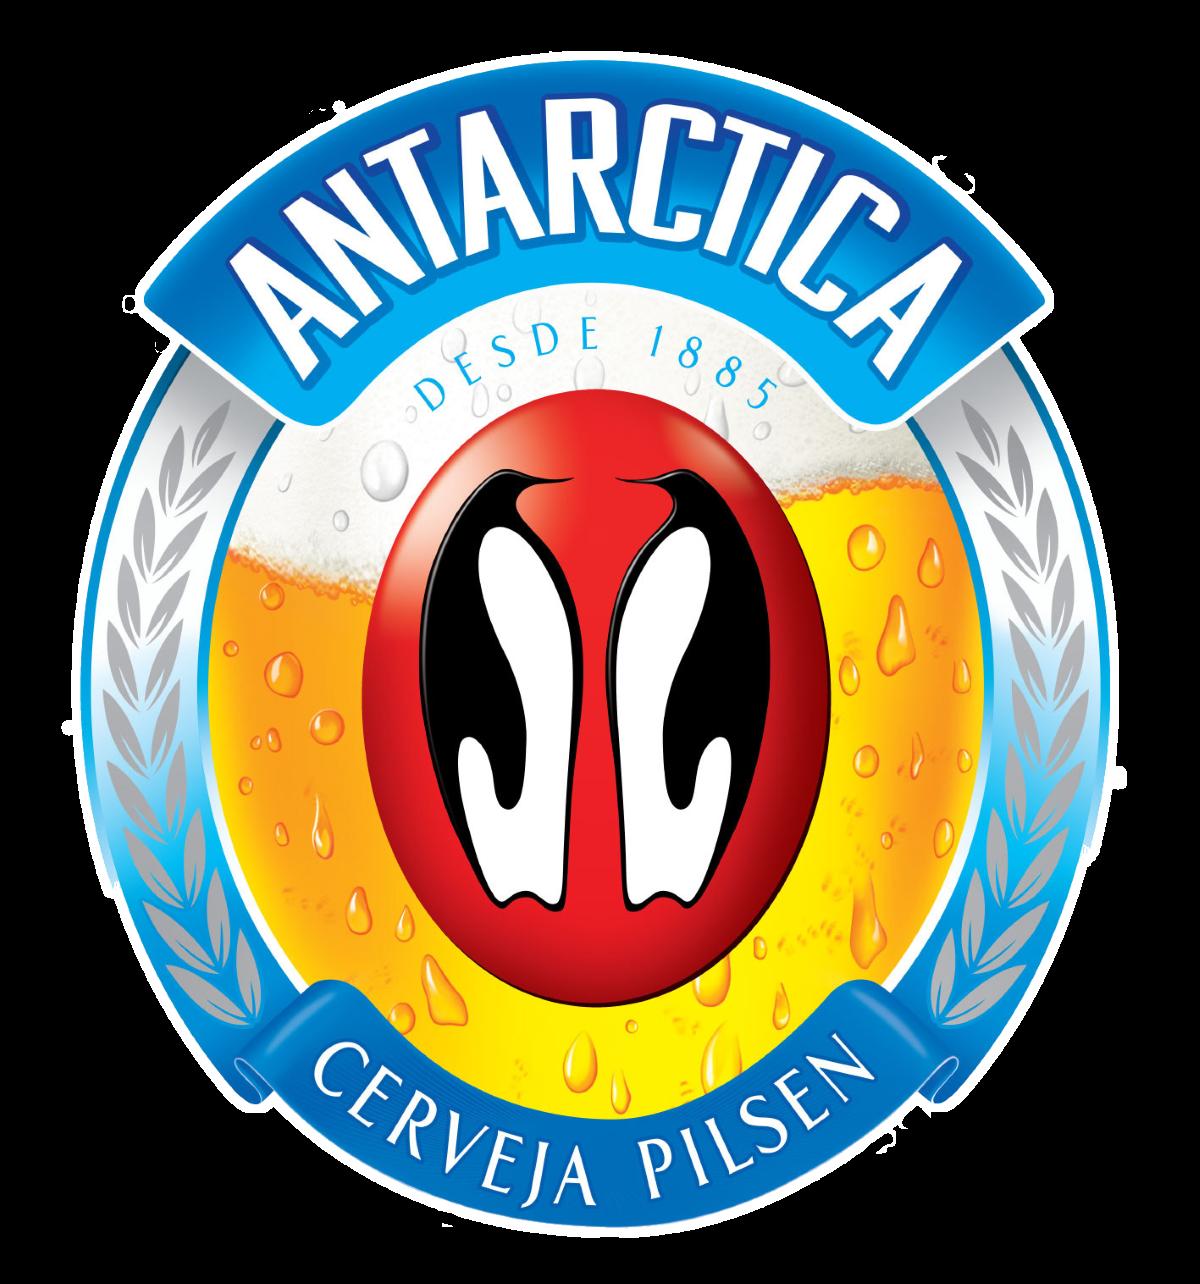 antarctica-cerveja-logo-2